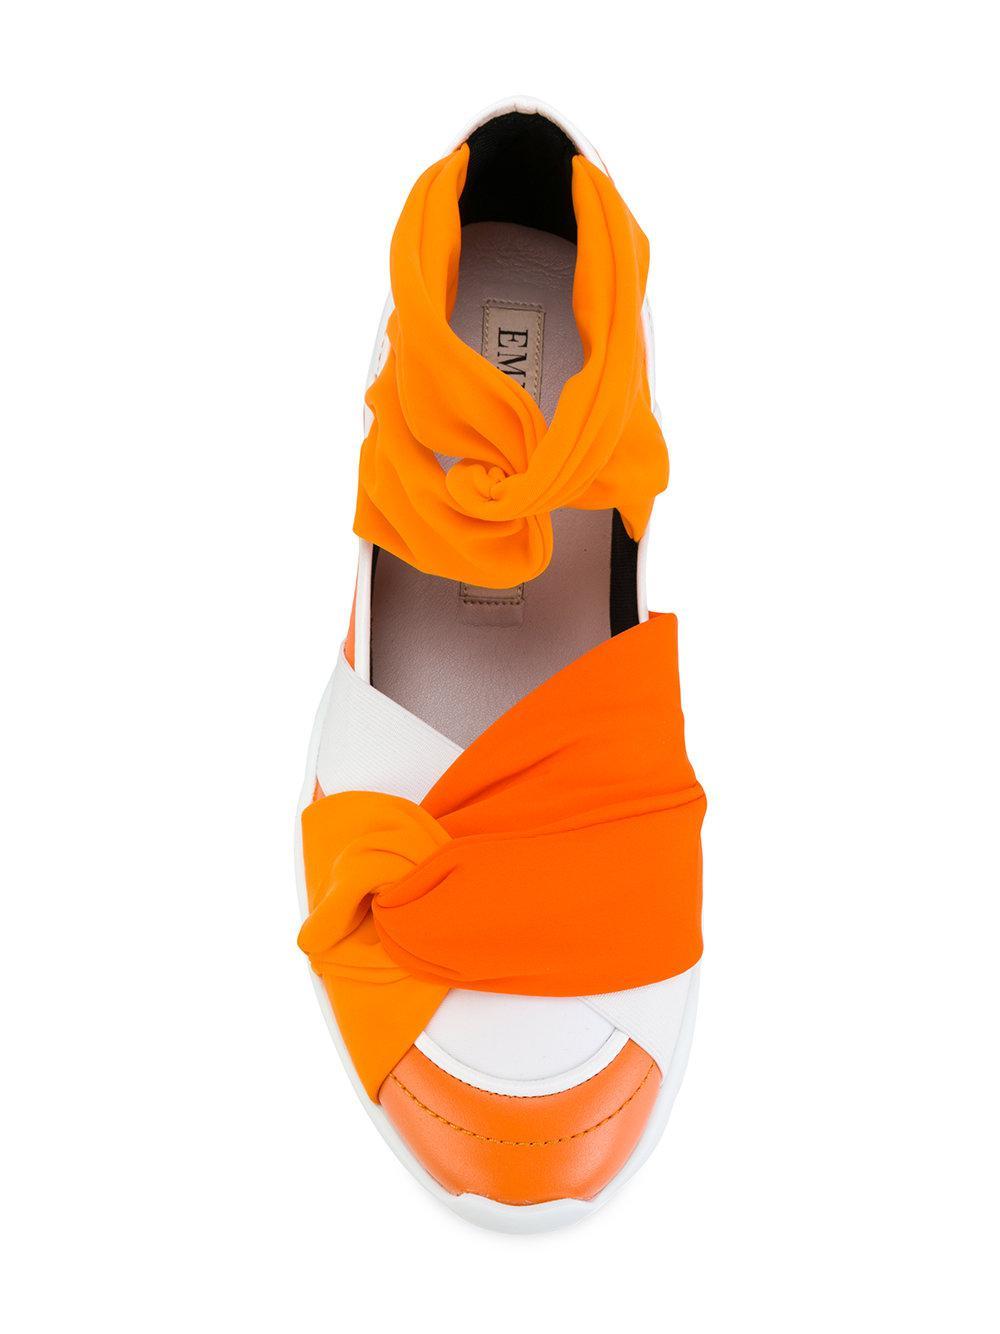 Emilio Pucci Leather Twisted Gradient Sneakers in Yellow & Orange (Orange)